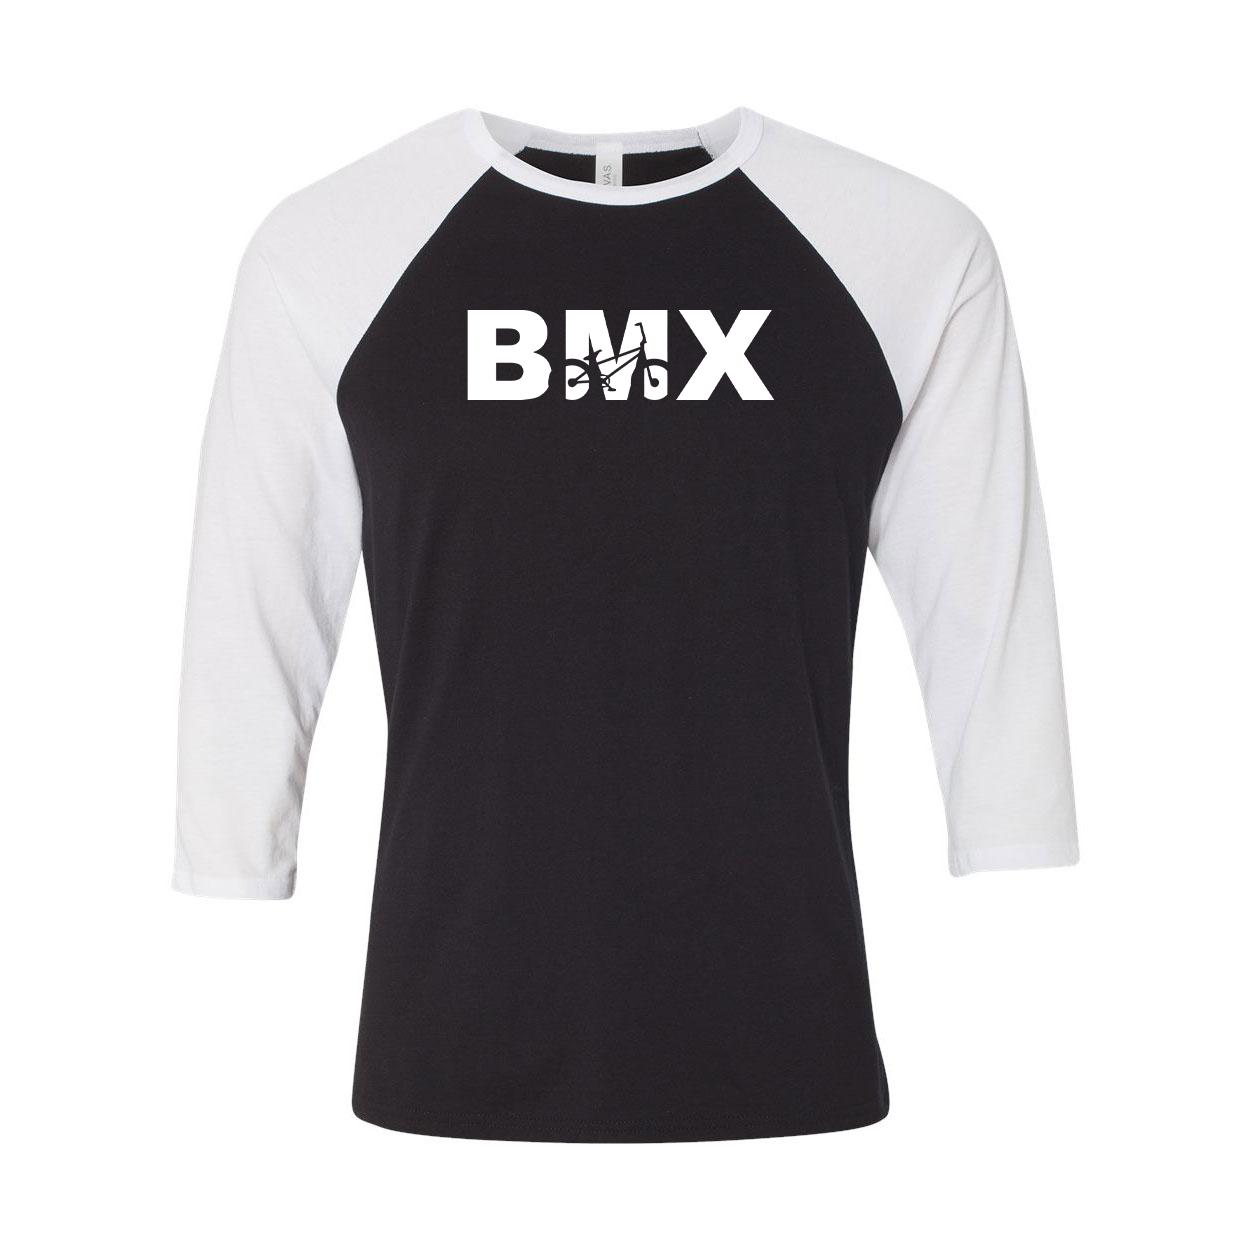 BMX Bike Logo Classic Raglan Shirt Black/White (White Logo)